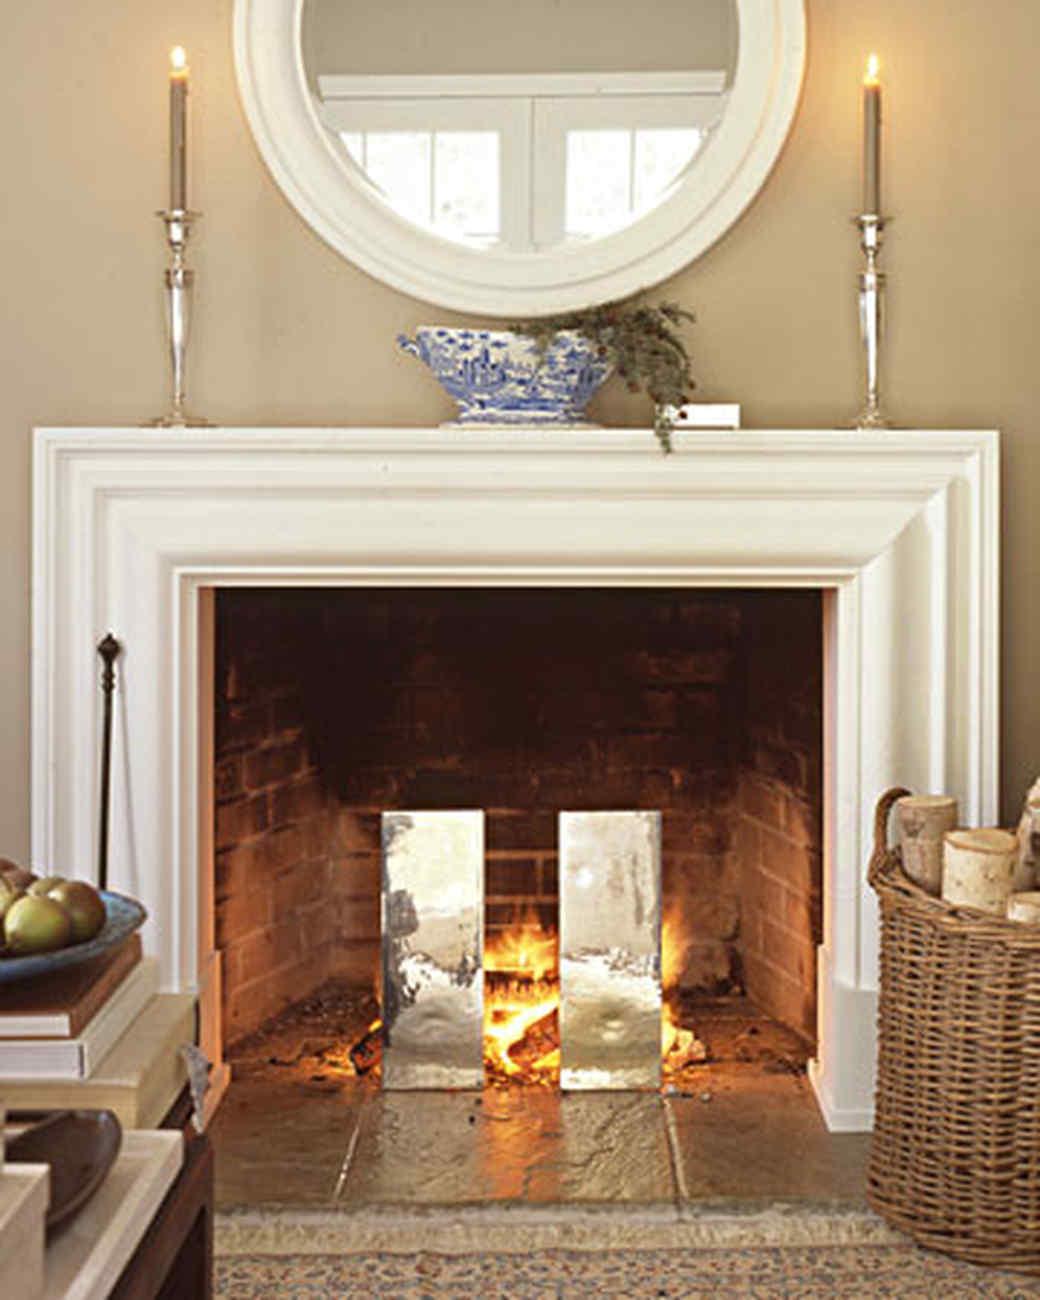 Decorating With Candlesticks Martha Stewart